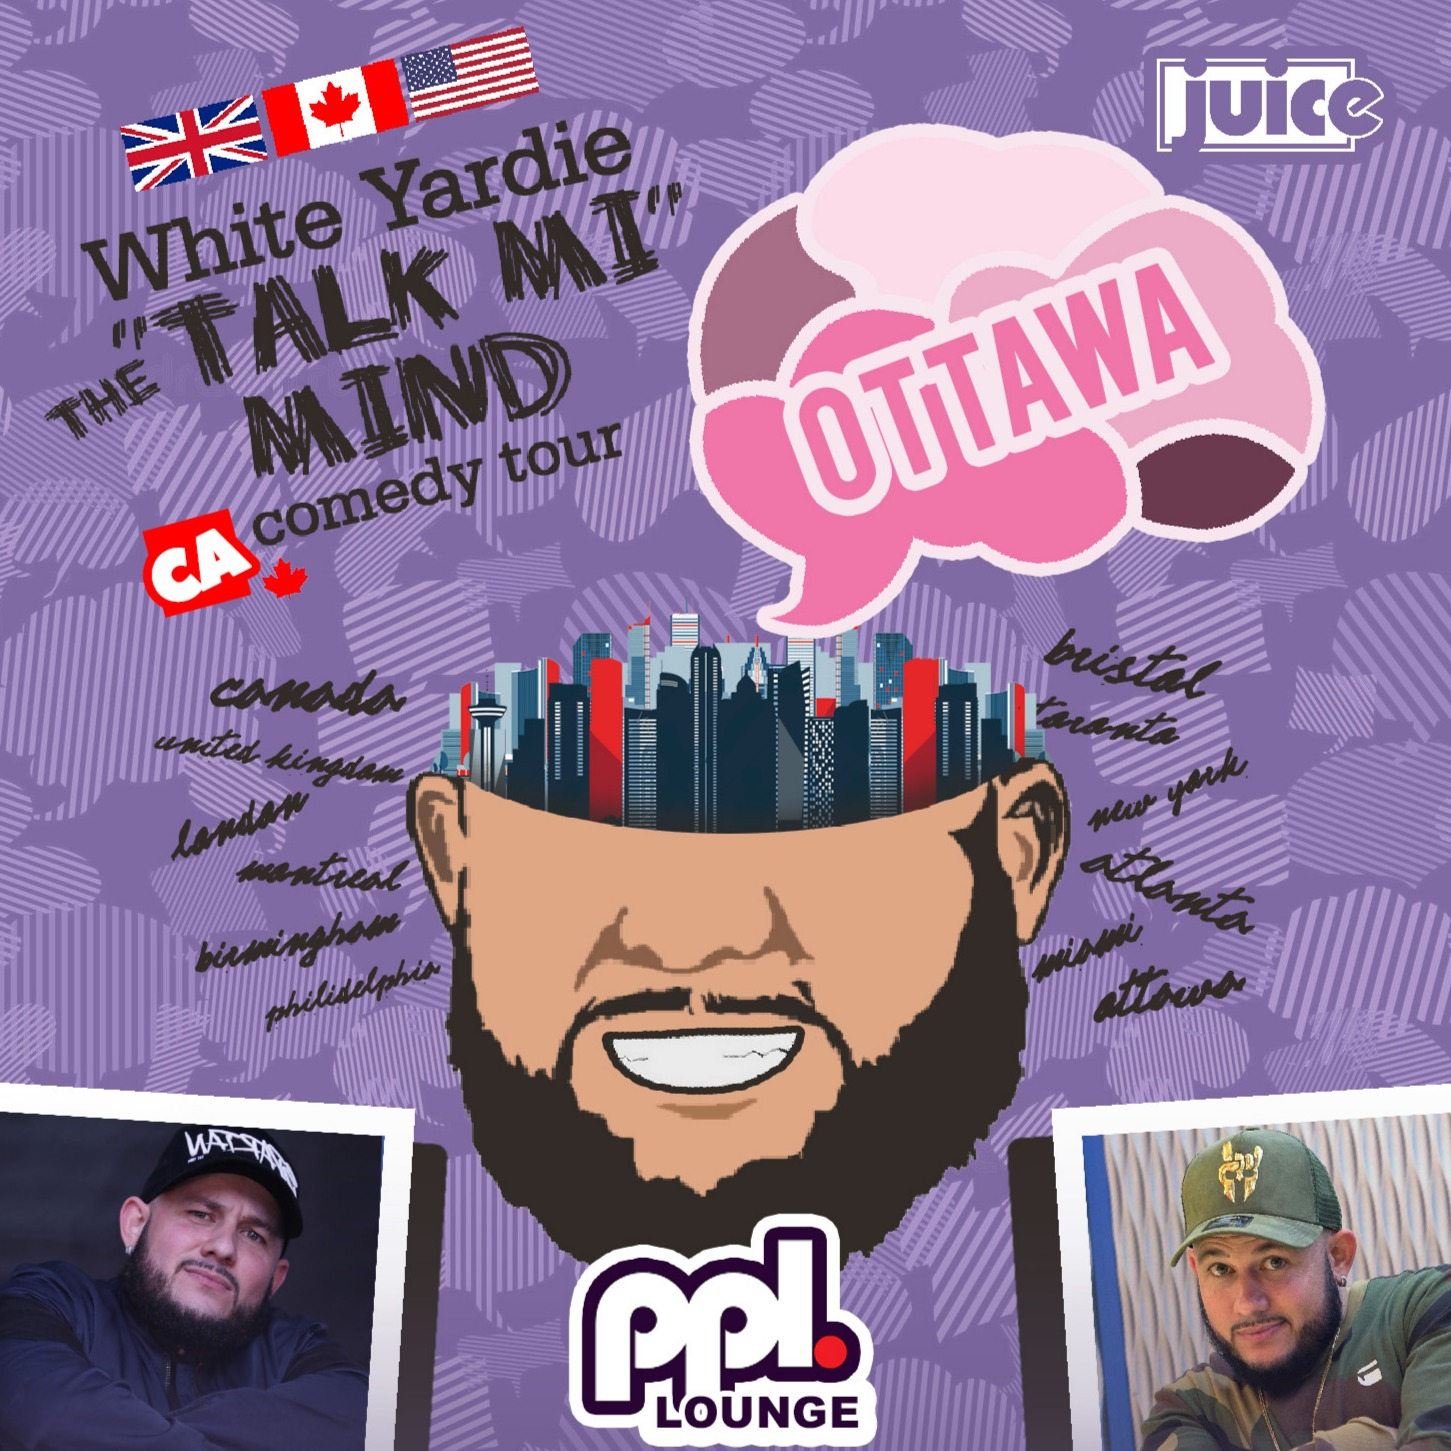 OTTAWA - JUICE Comedy presents WHITE YARDIE'S 'Talk Mi Mind'